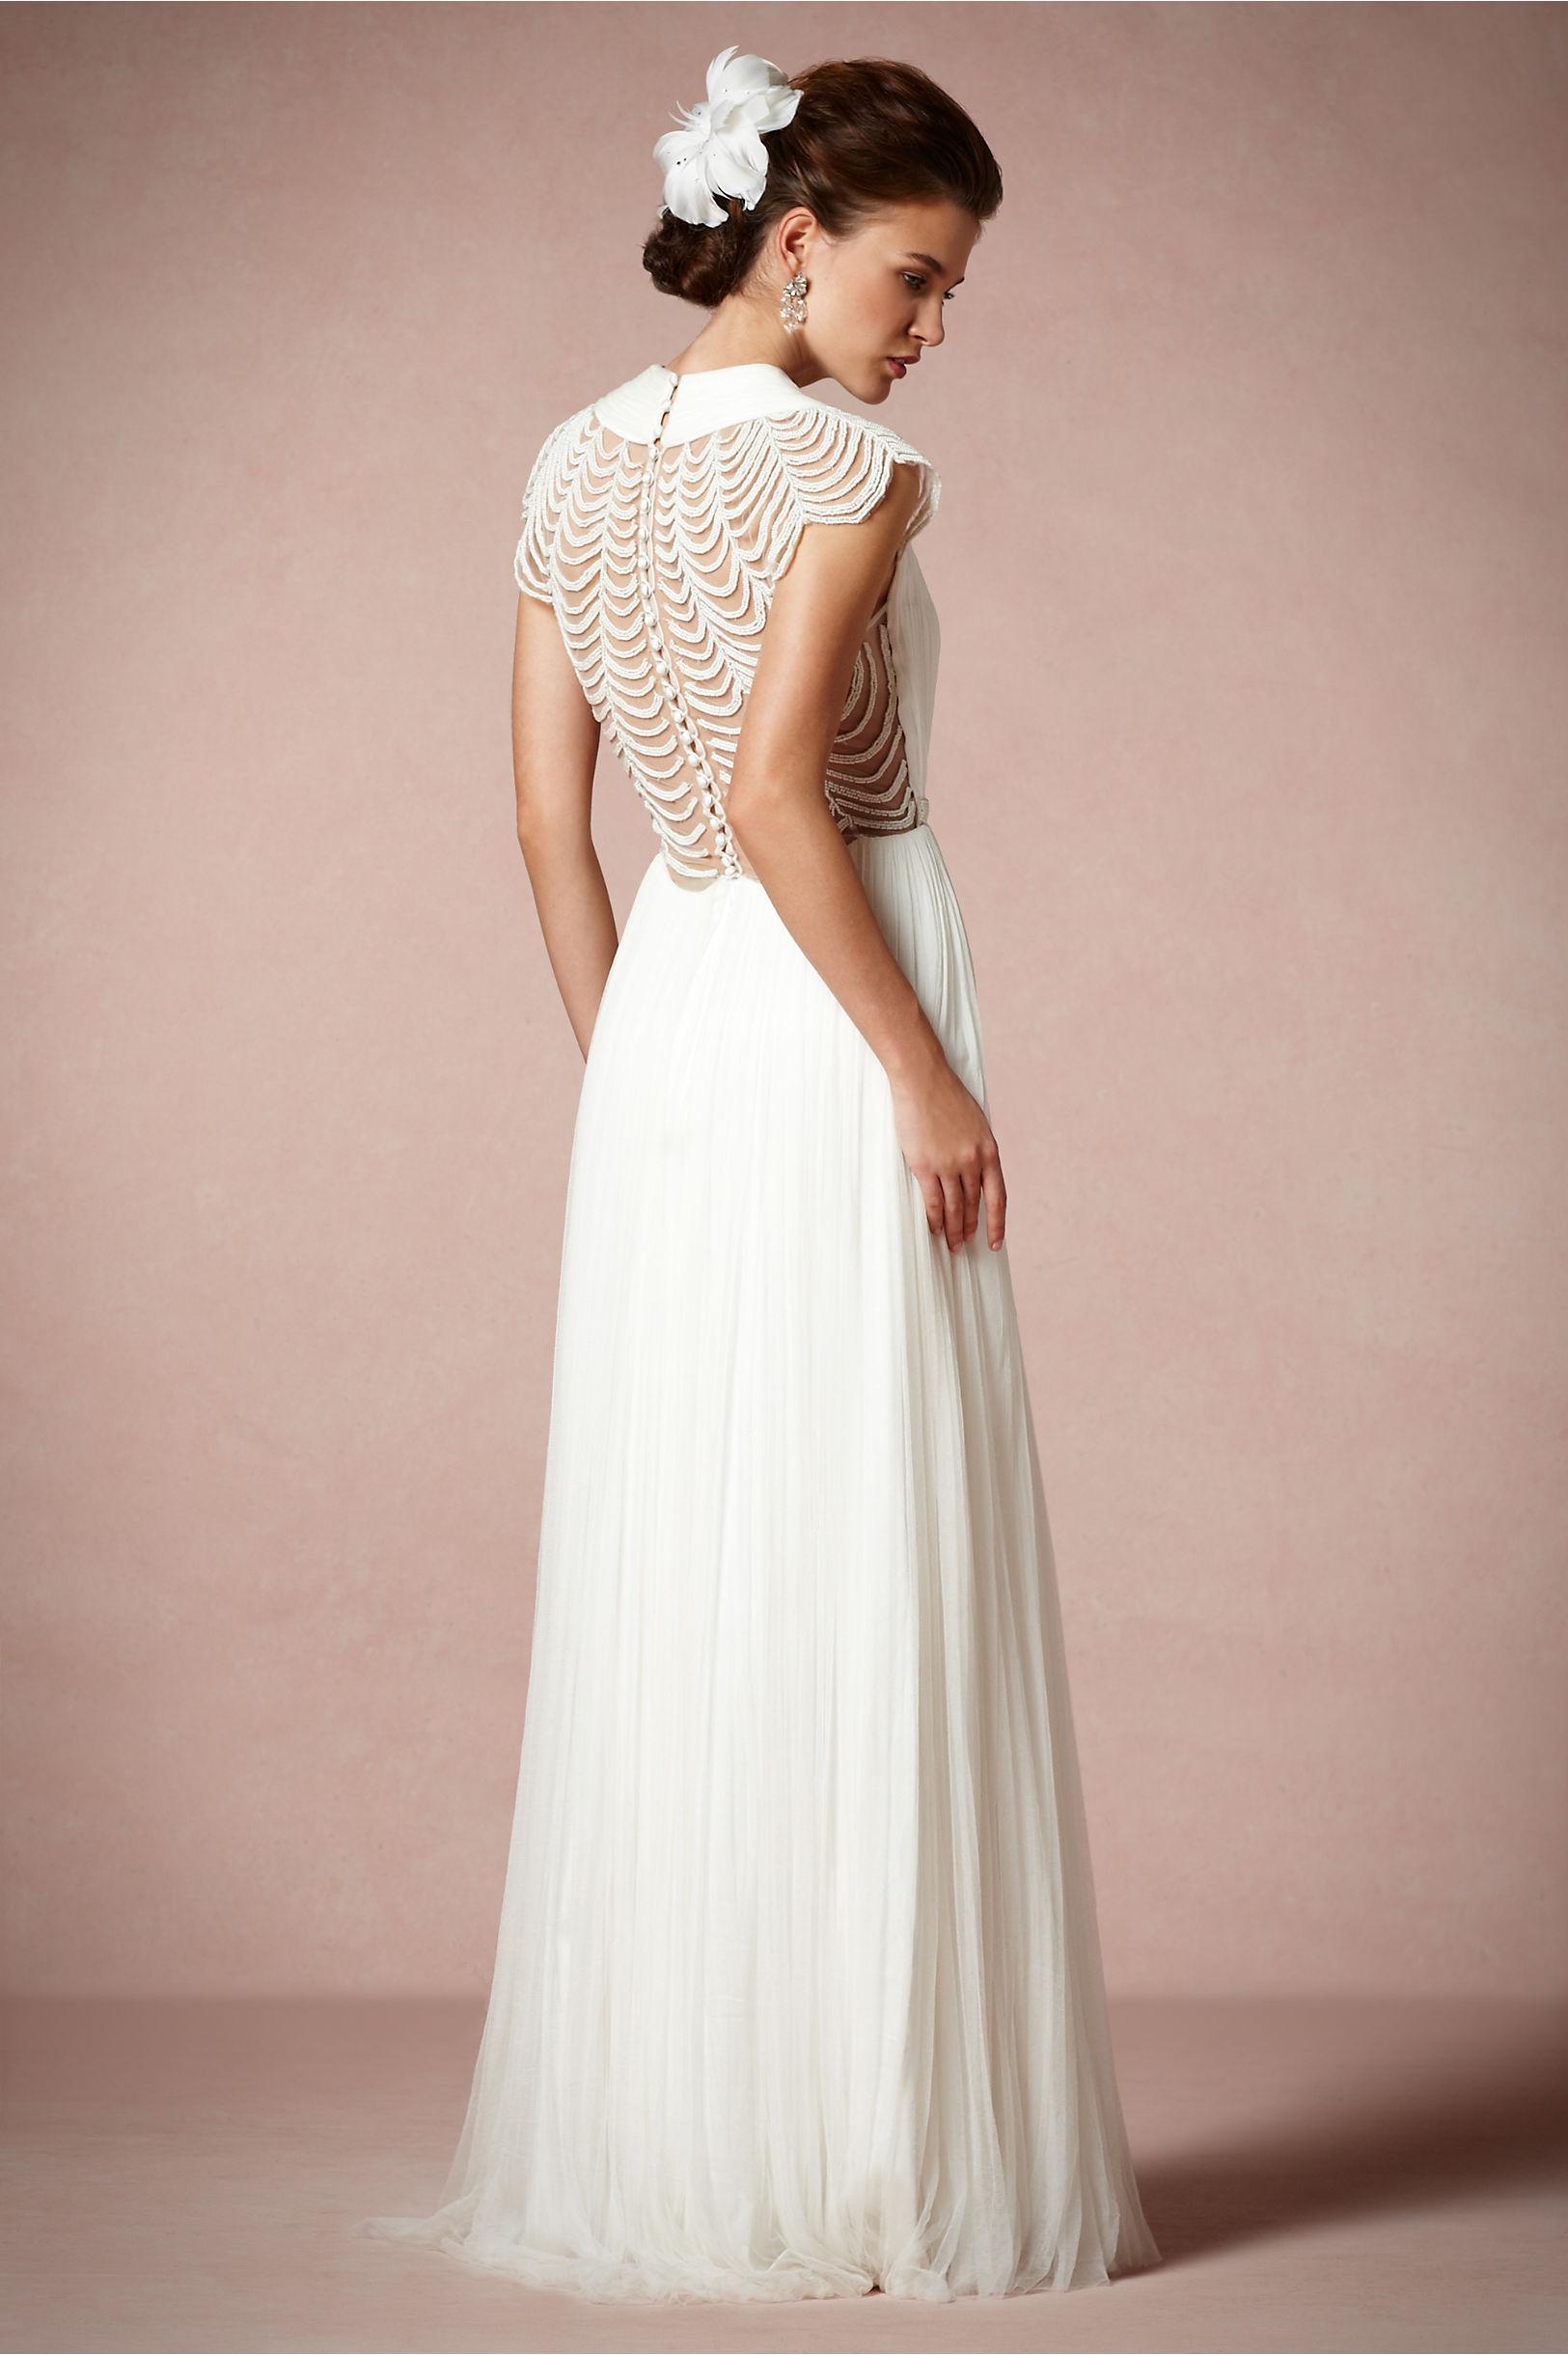 Ortensia Gown kr 18 105,-